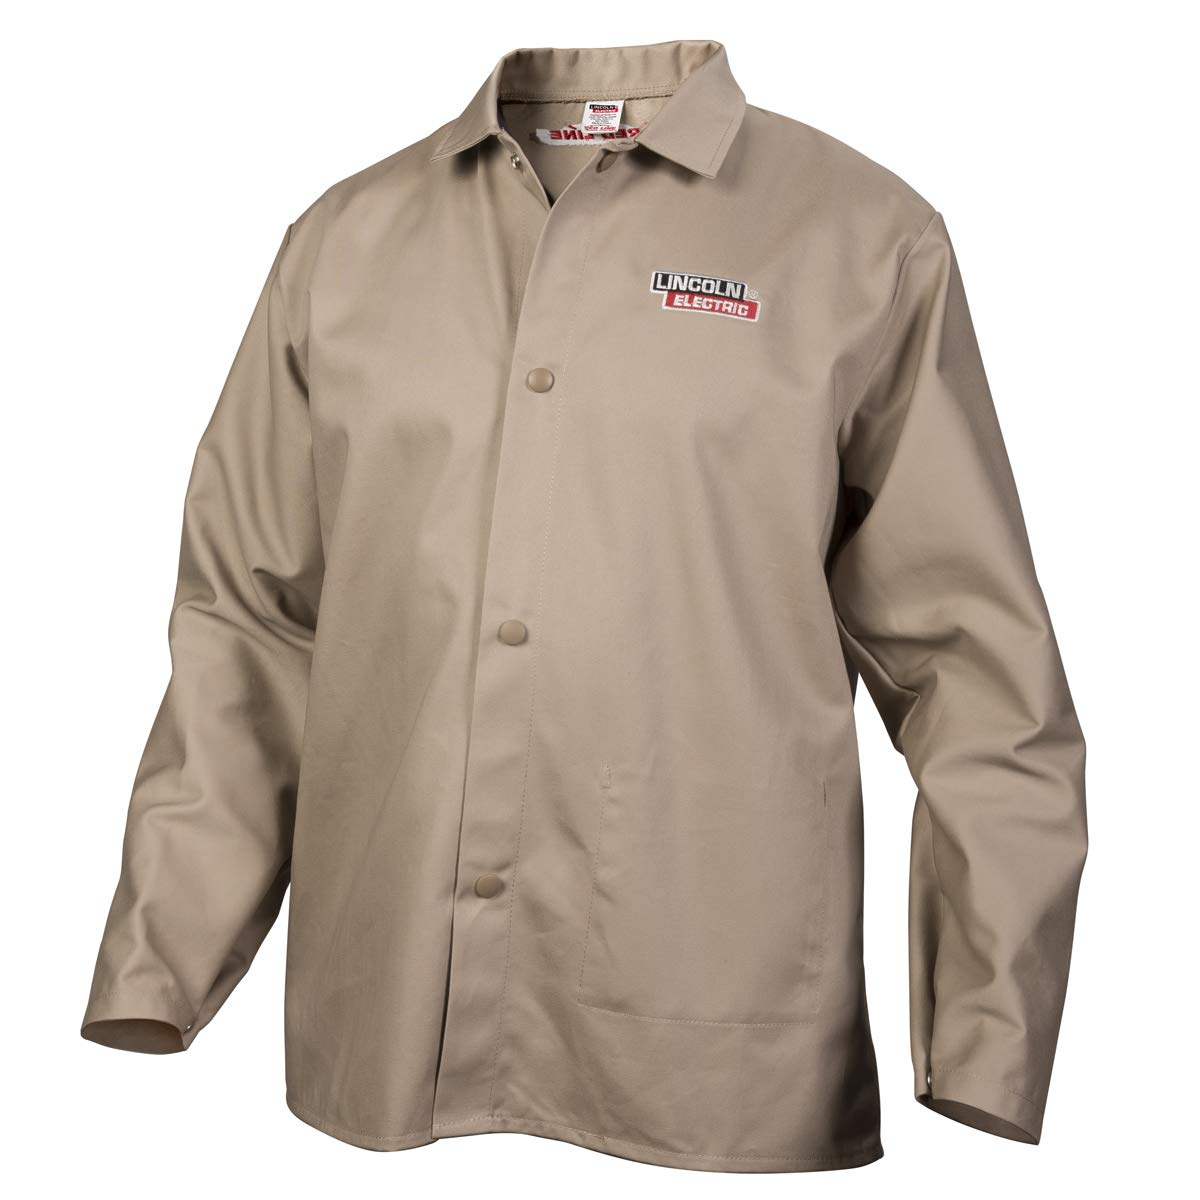 Lincoln Electric Premium Flame Resistant (FR) Cotton Welding Jacket | Comfortable | Khaki / Tan | XL | K3317-XL